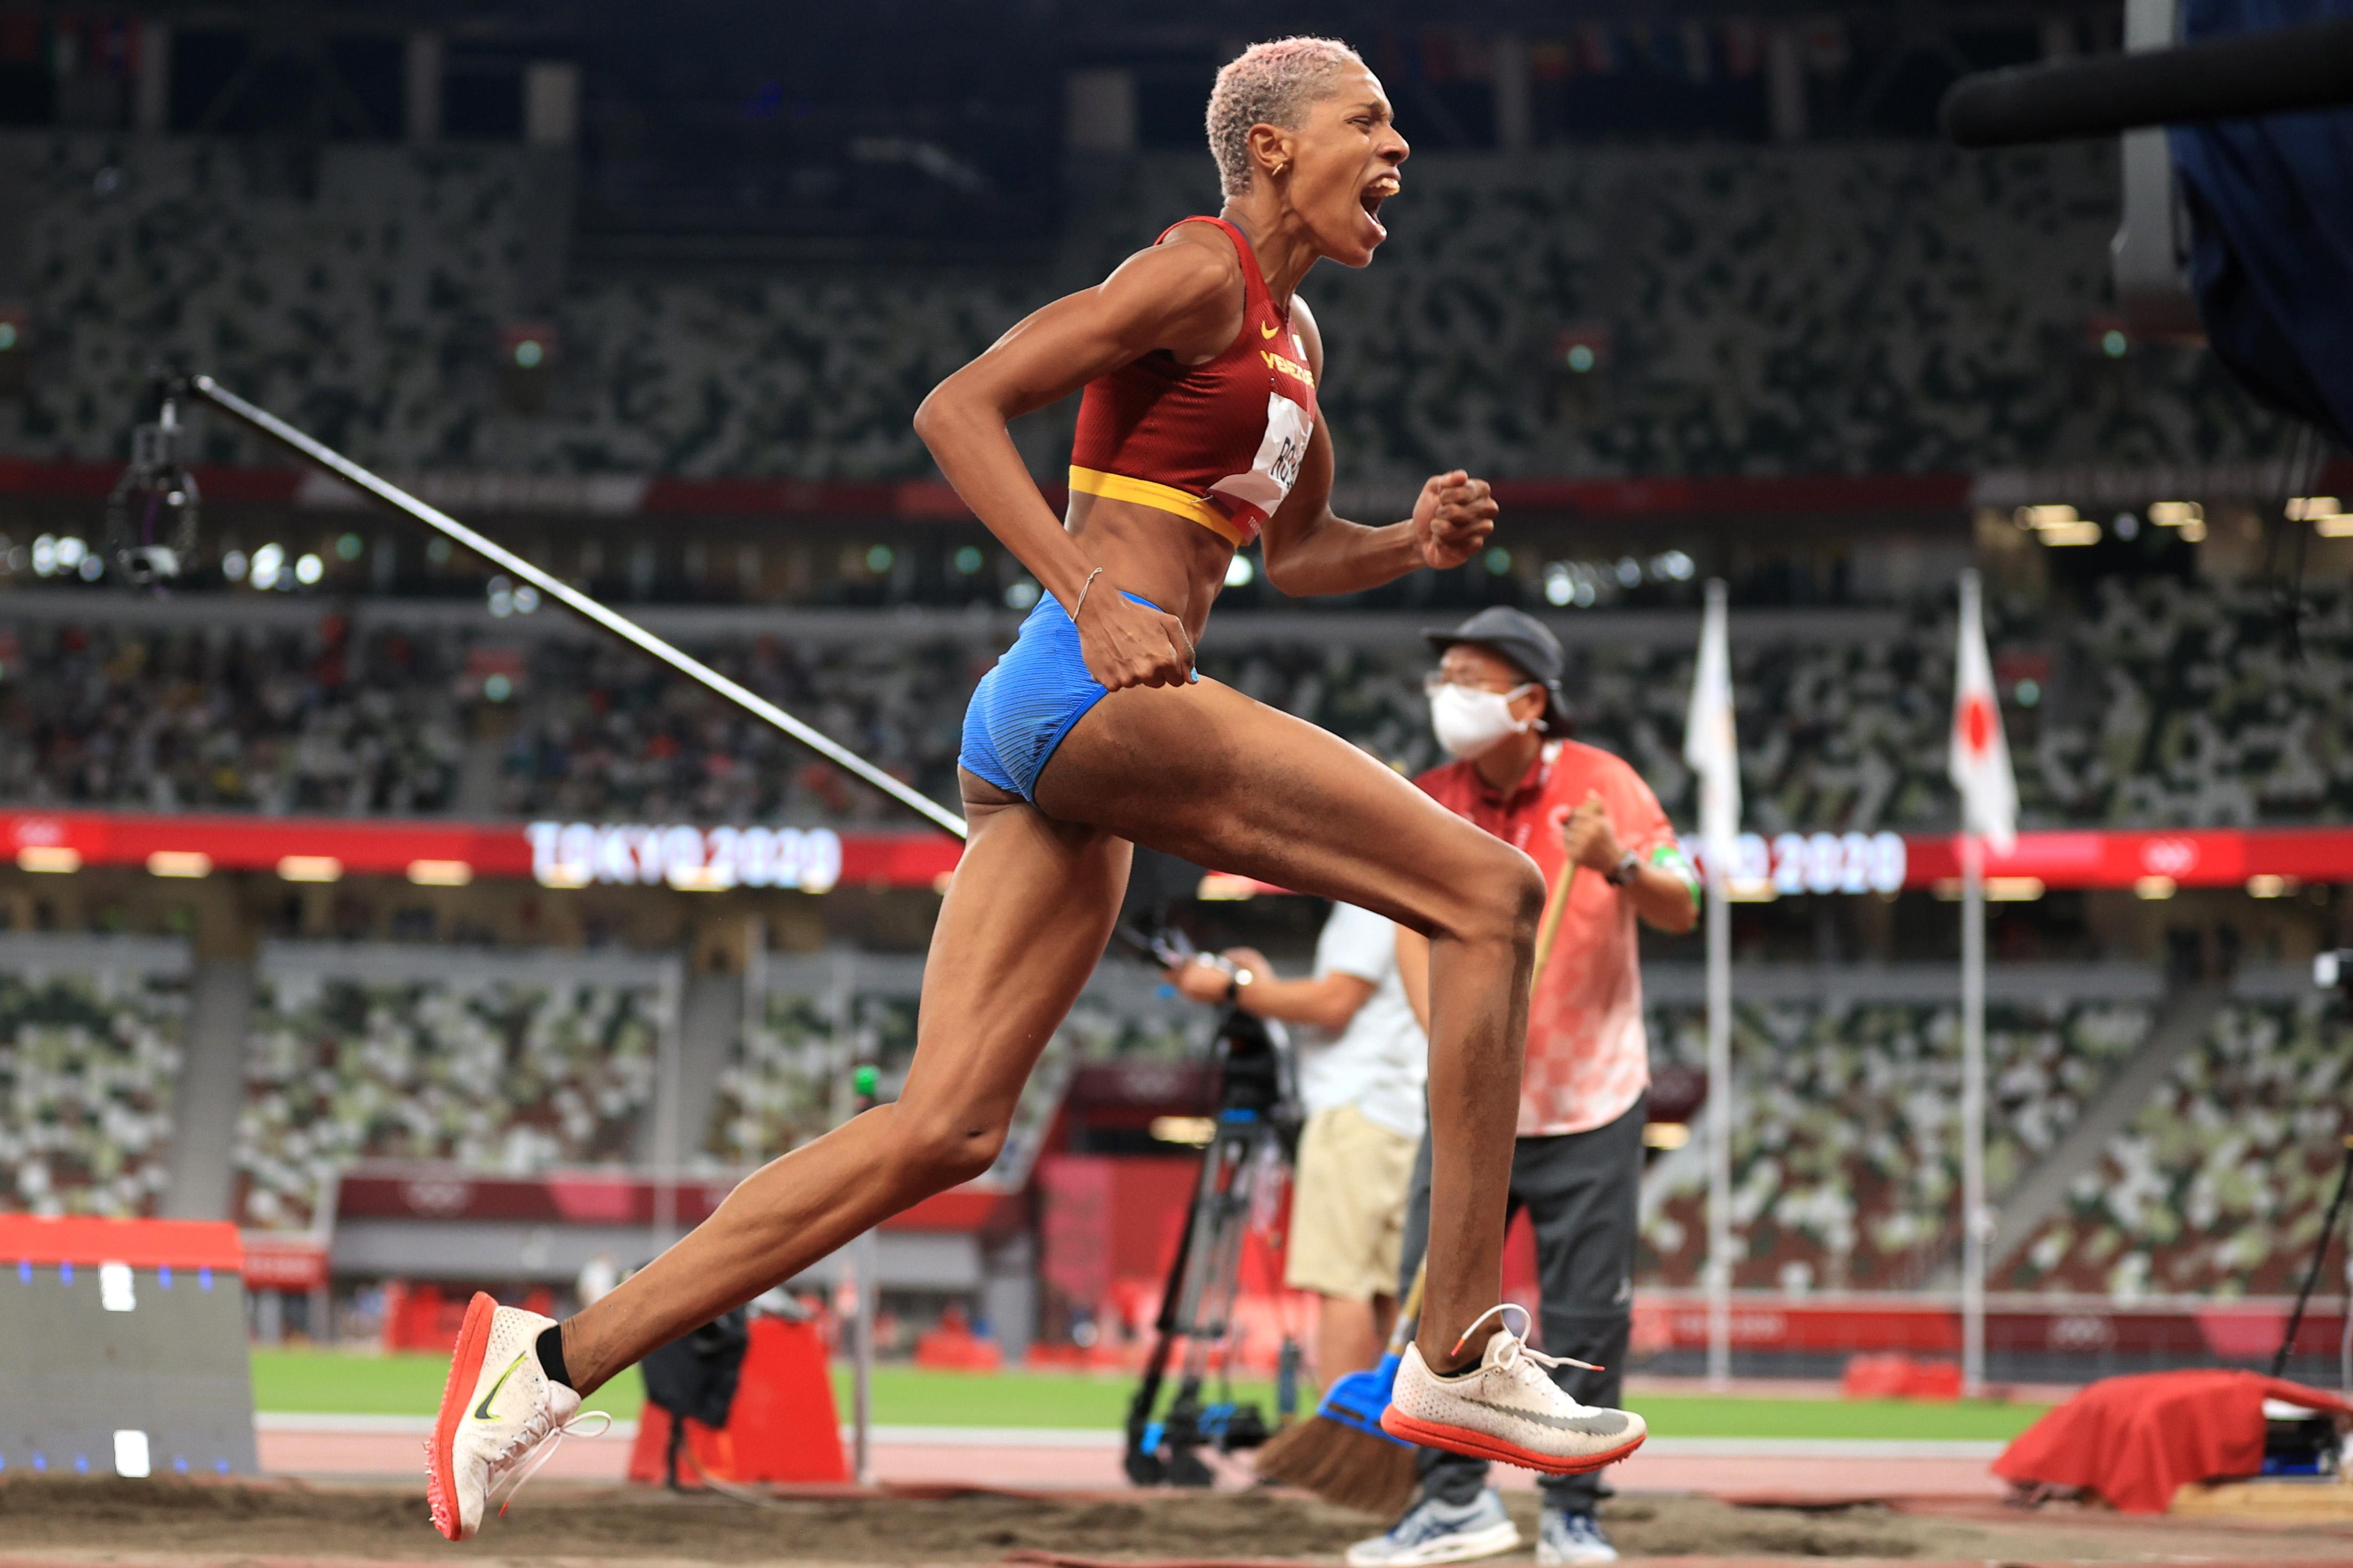 Tokyo 2020 Olympics - Athletics - Women's Triple Jump - Final - OLS - Olympic Stadium, Tokyo, Japan – August 1, 2021. Yulimar Rojas of Venezuela celebrates after winning the gold medal REUTERS/Hannah Mckay